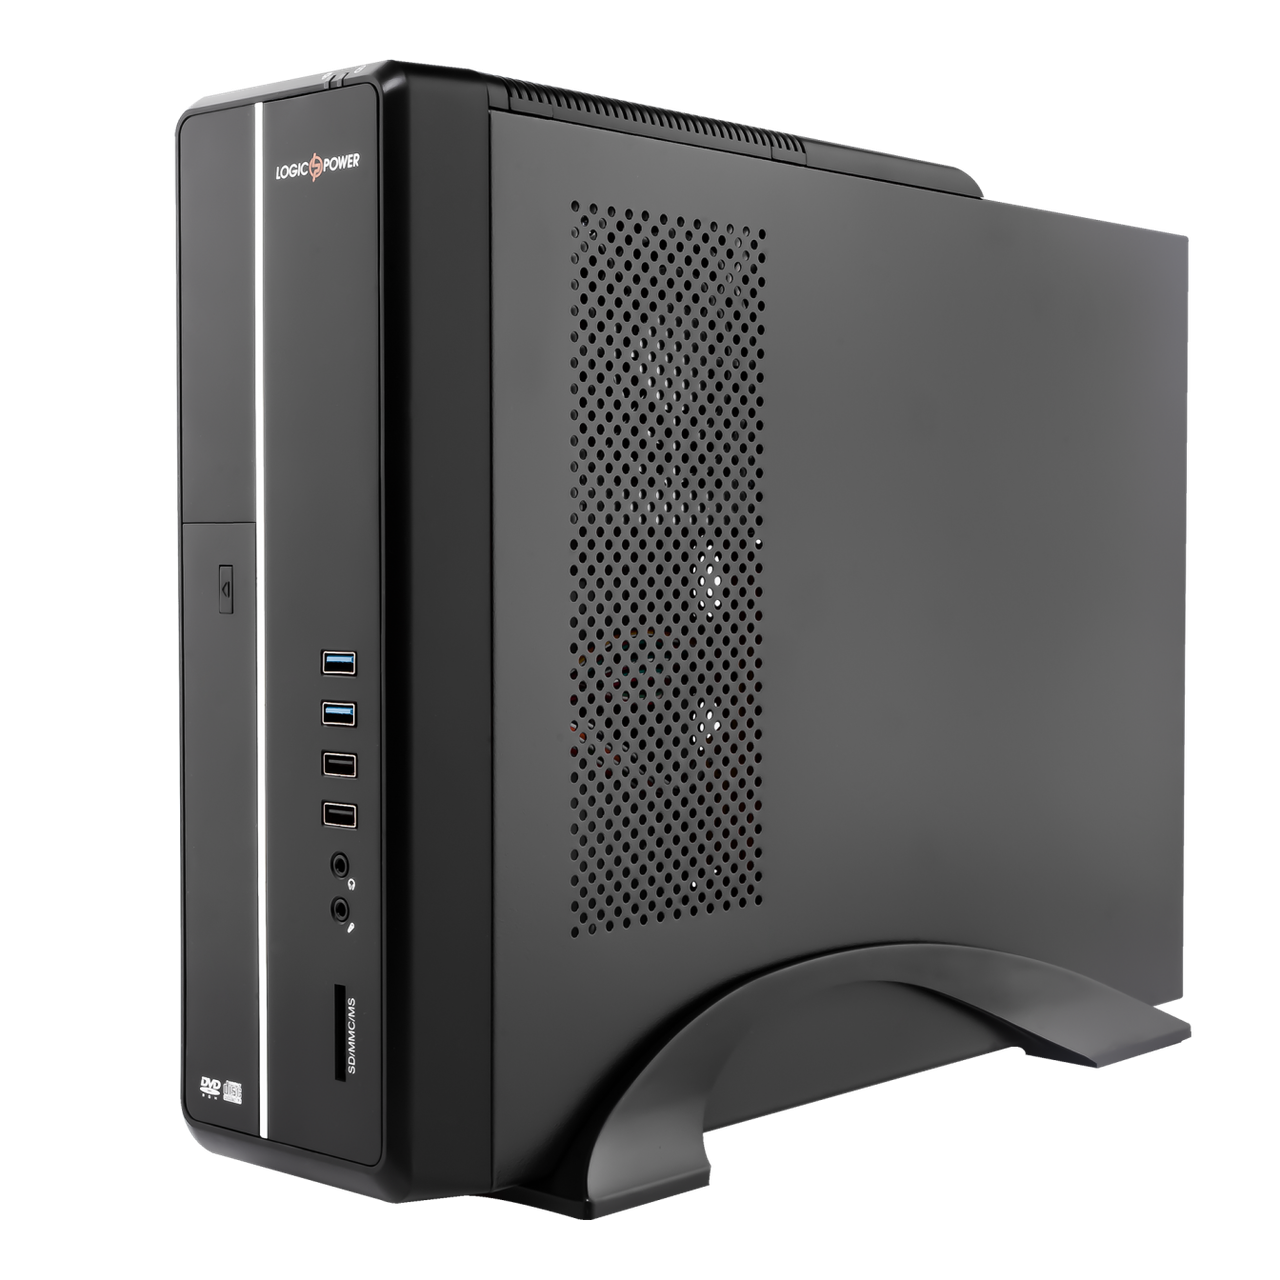 Корпус Slim LP S602 BS 2хUSB2.0, 2хUSB3.0 + Блок питания Micro ATX 400W 8см